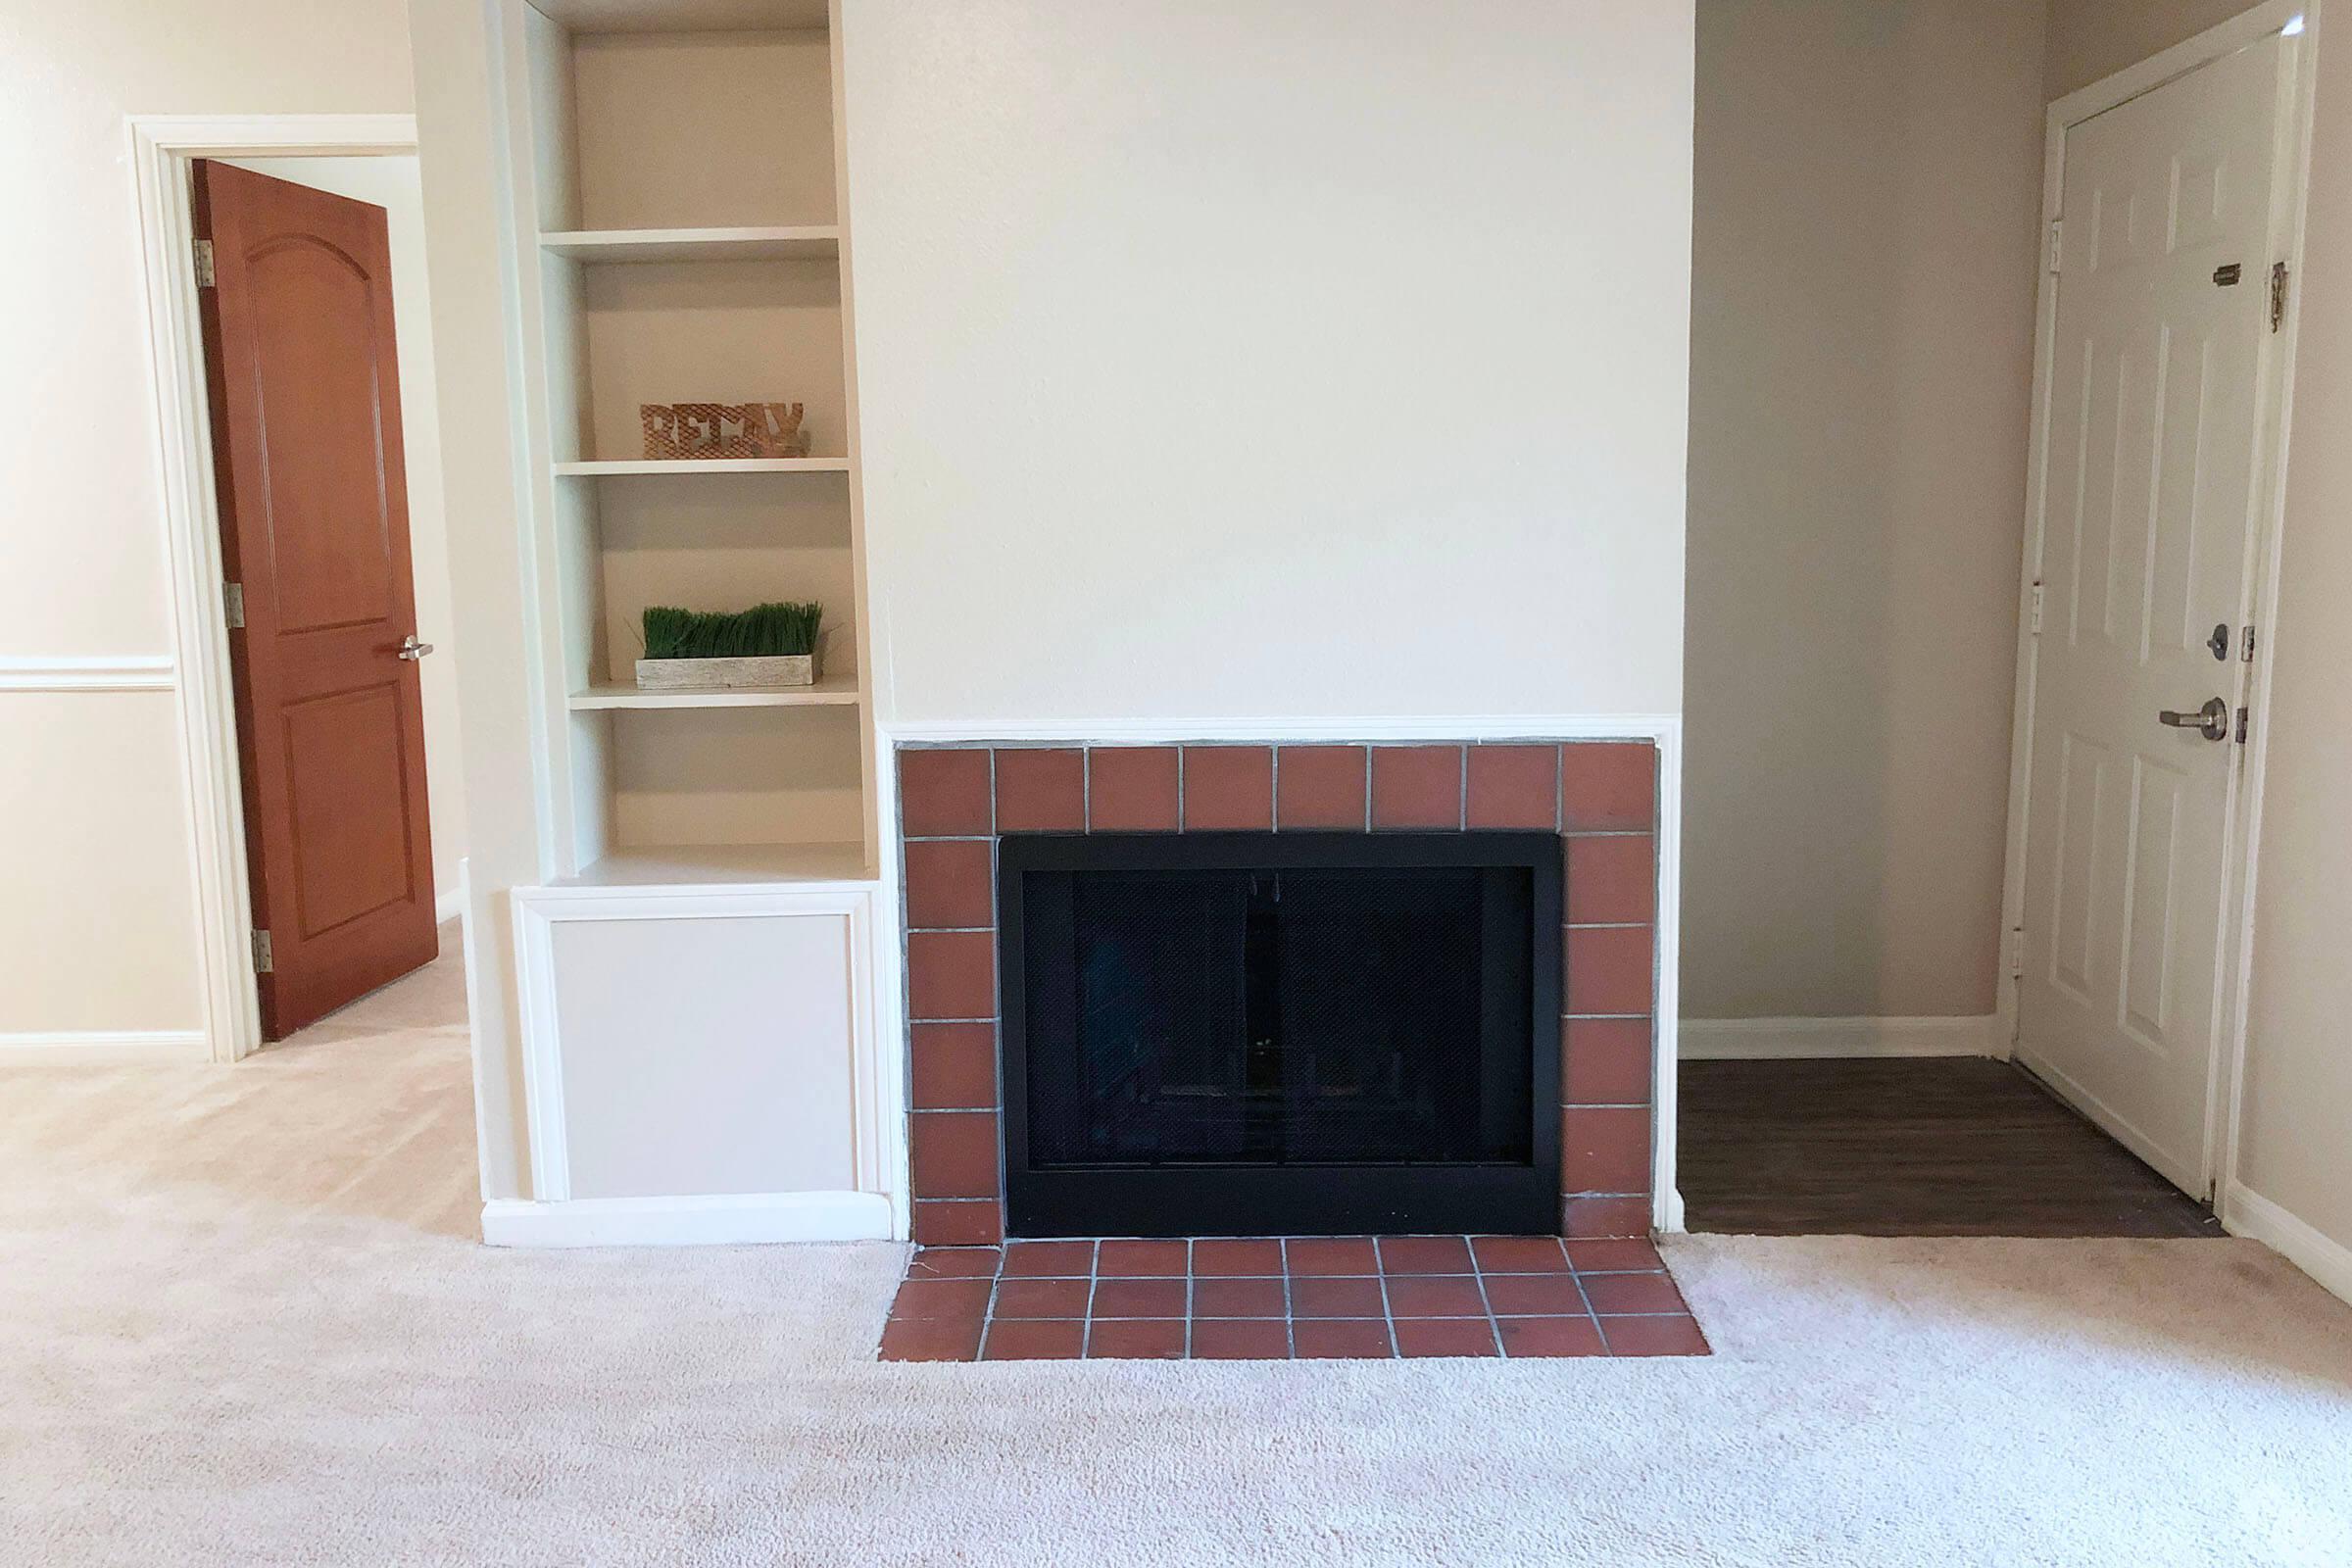 an empty brick room